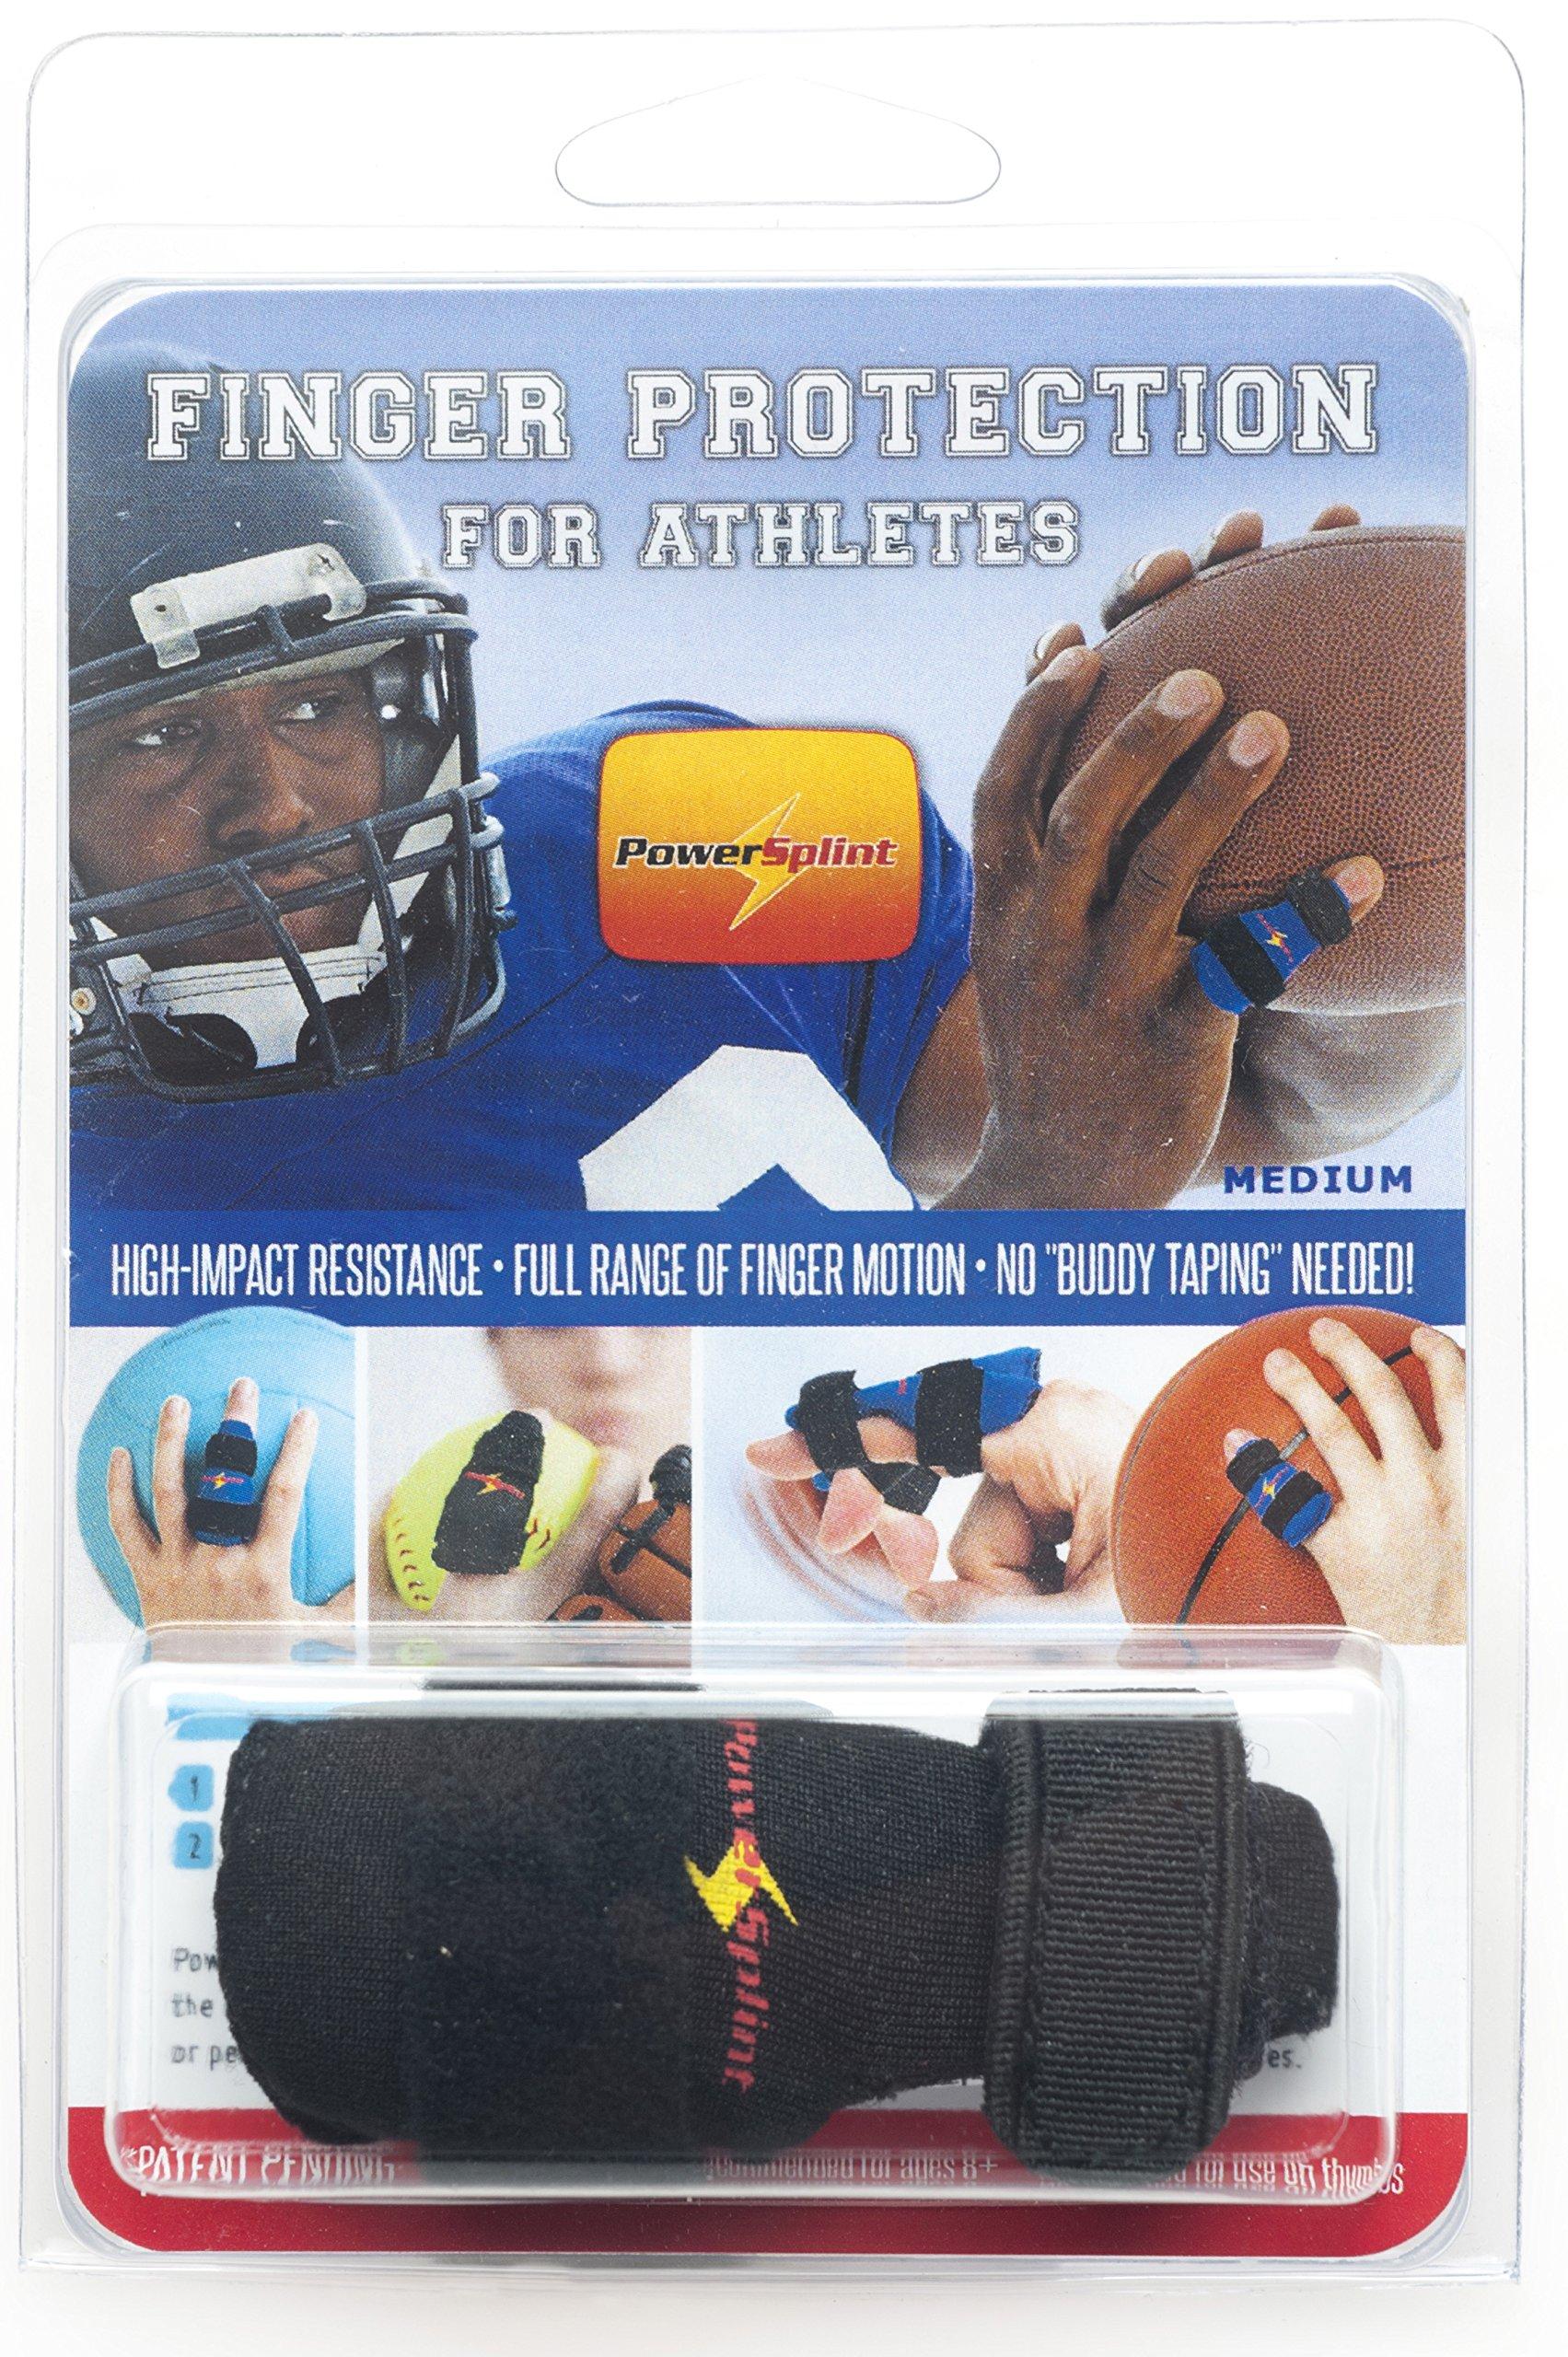 PowerSplint PRO Finger Guard for Athletes